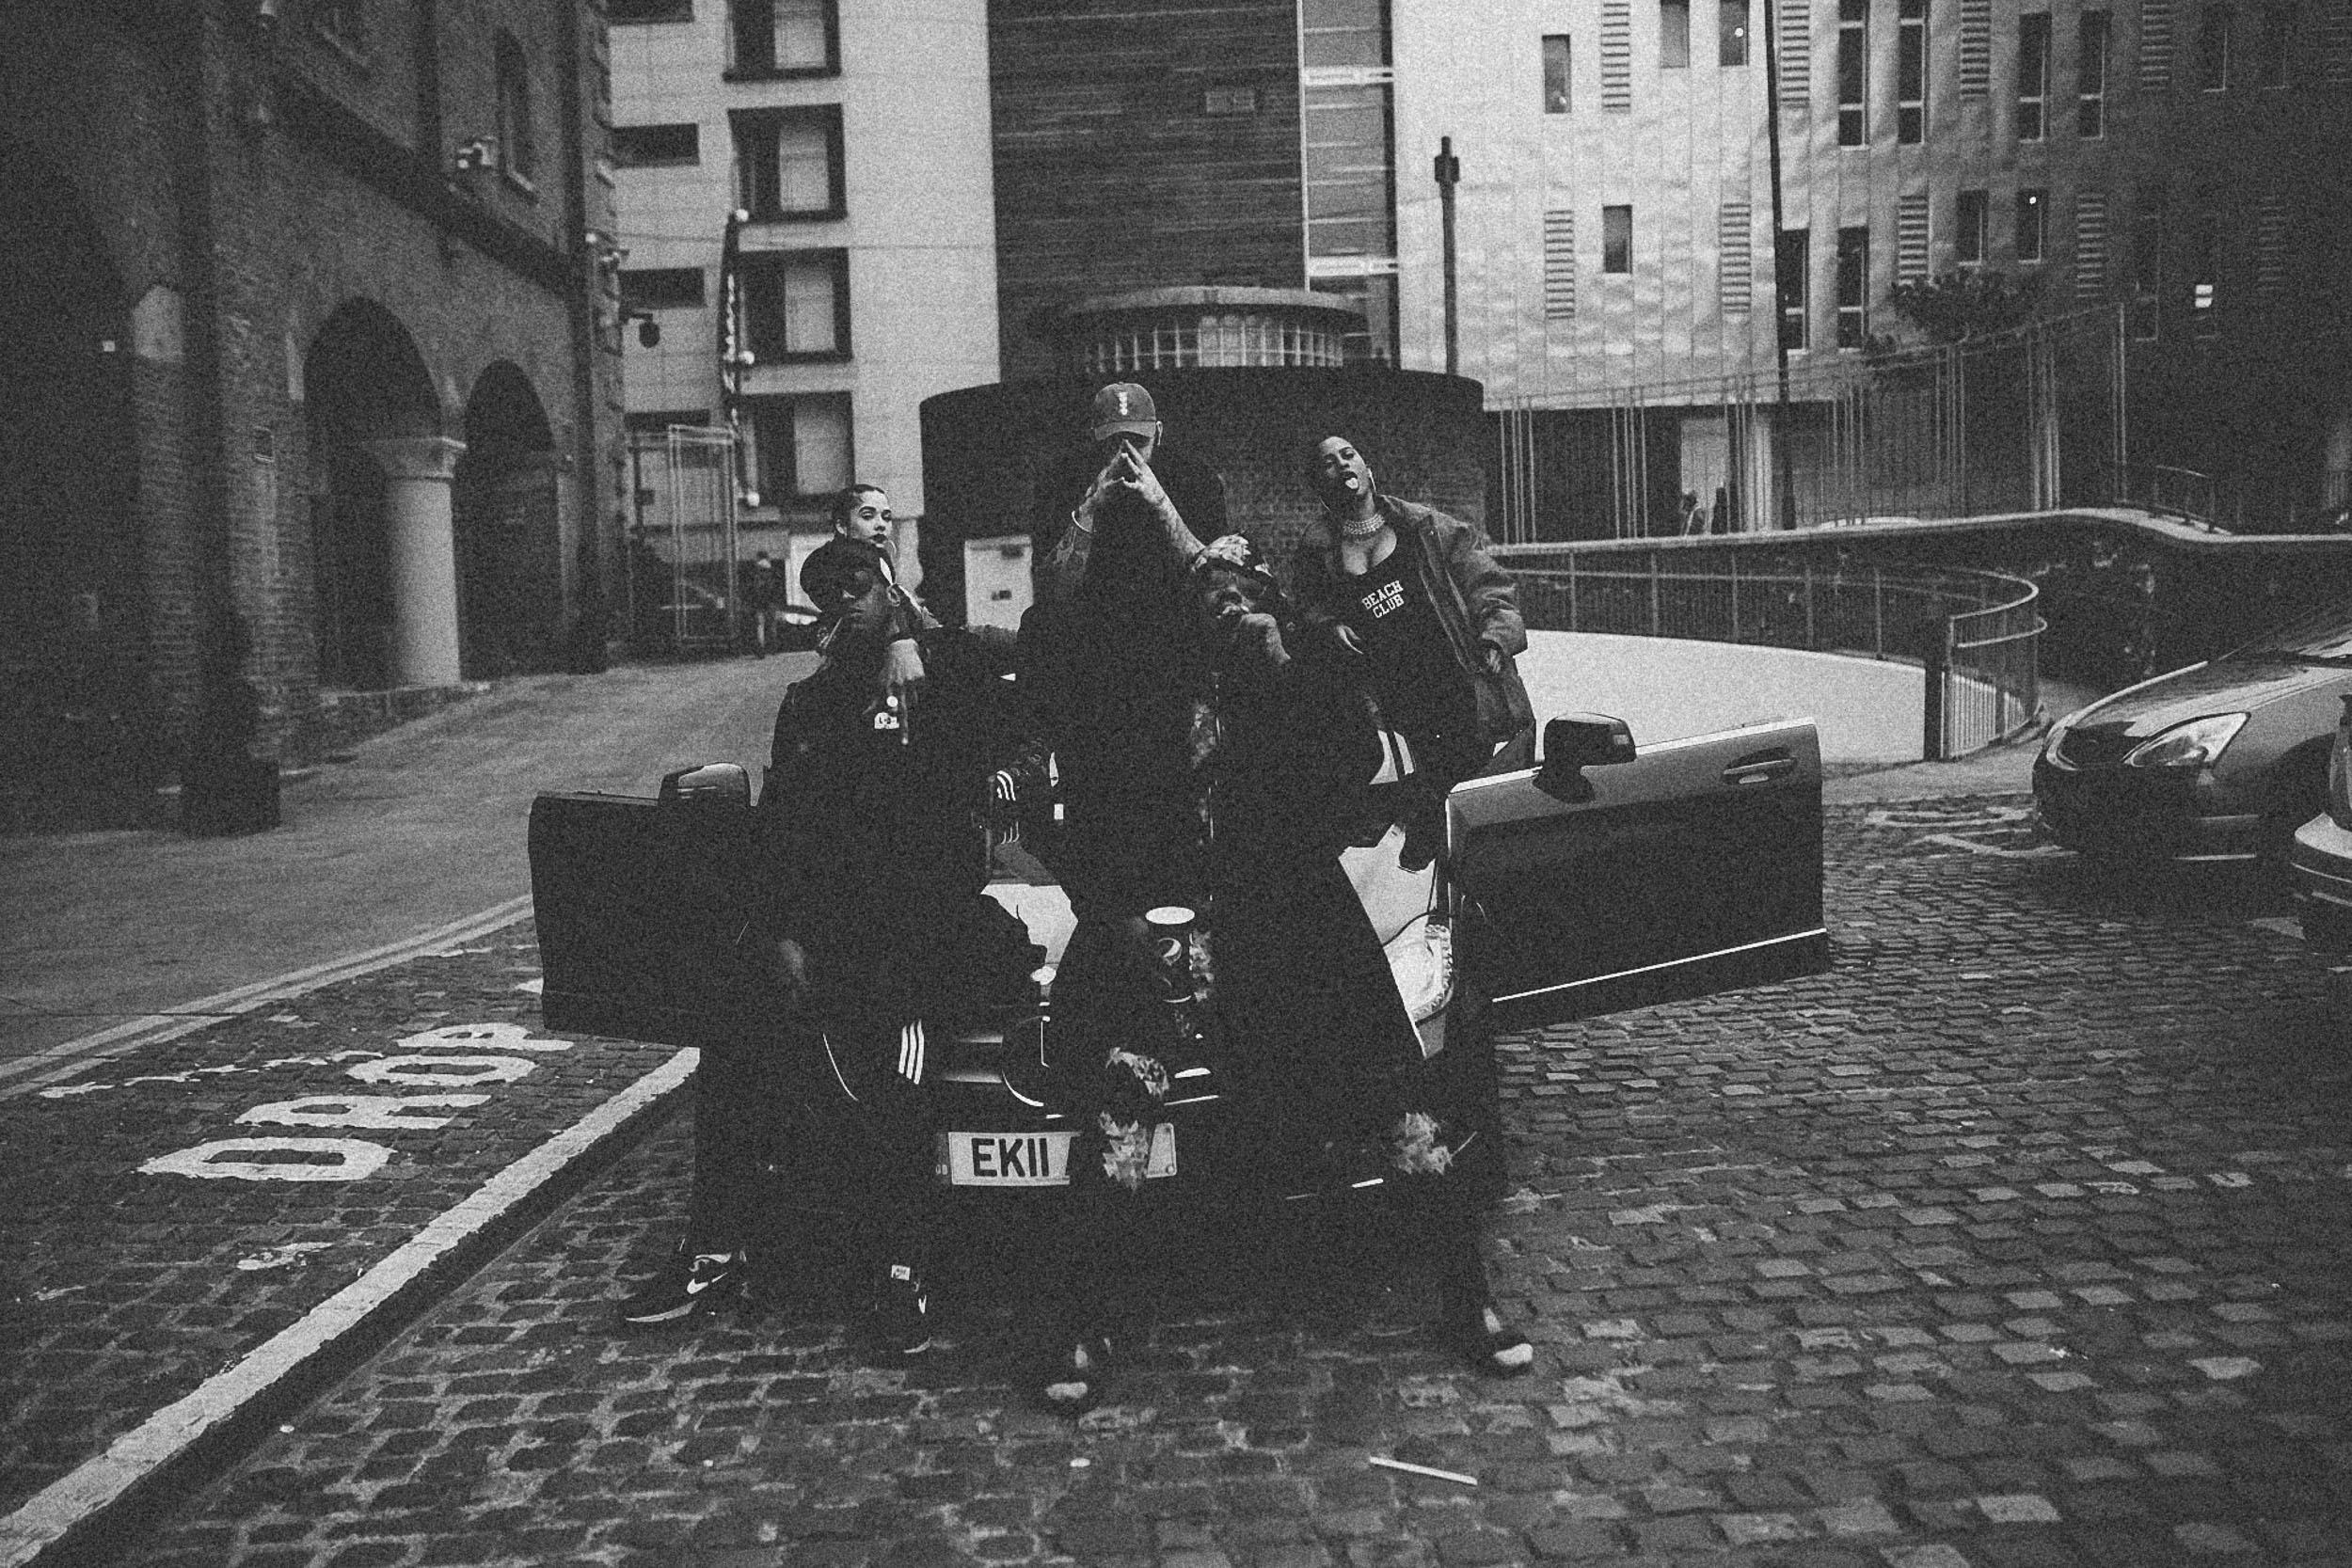 film-archive-kc.locke-38.jpg